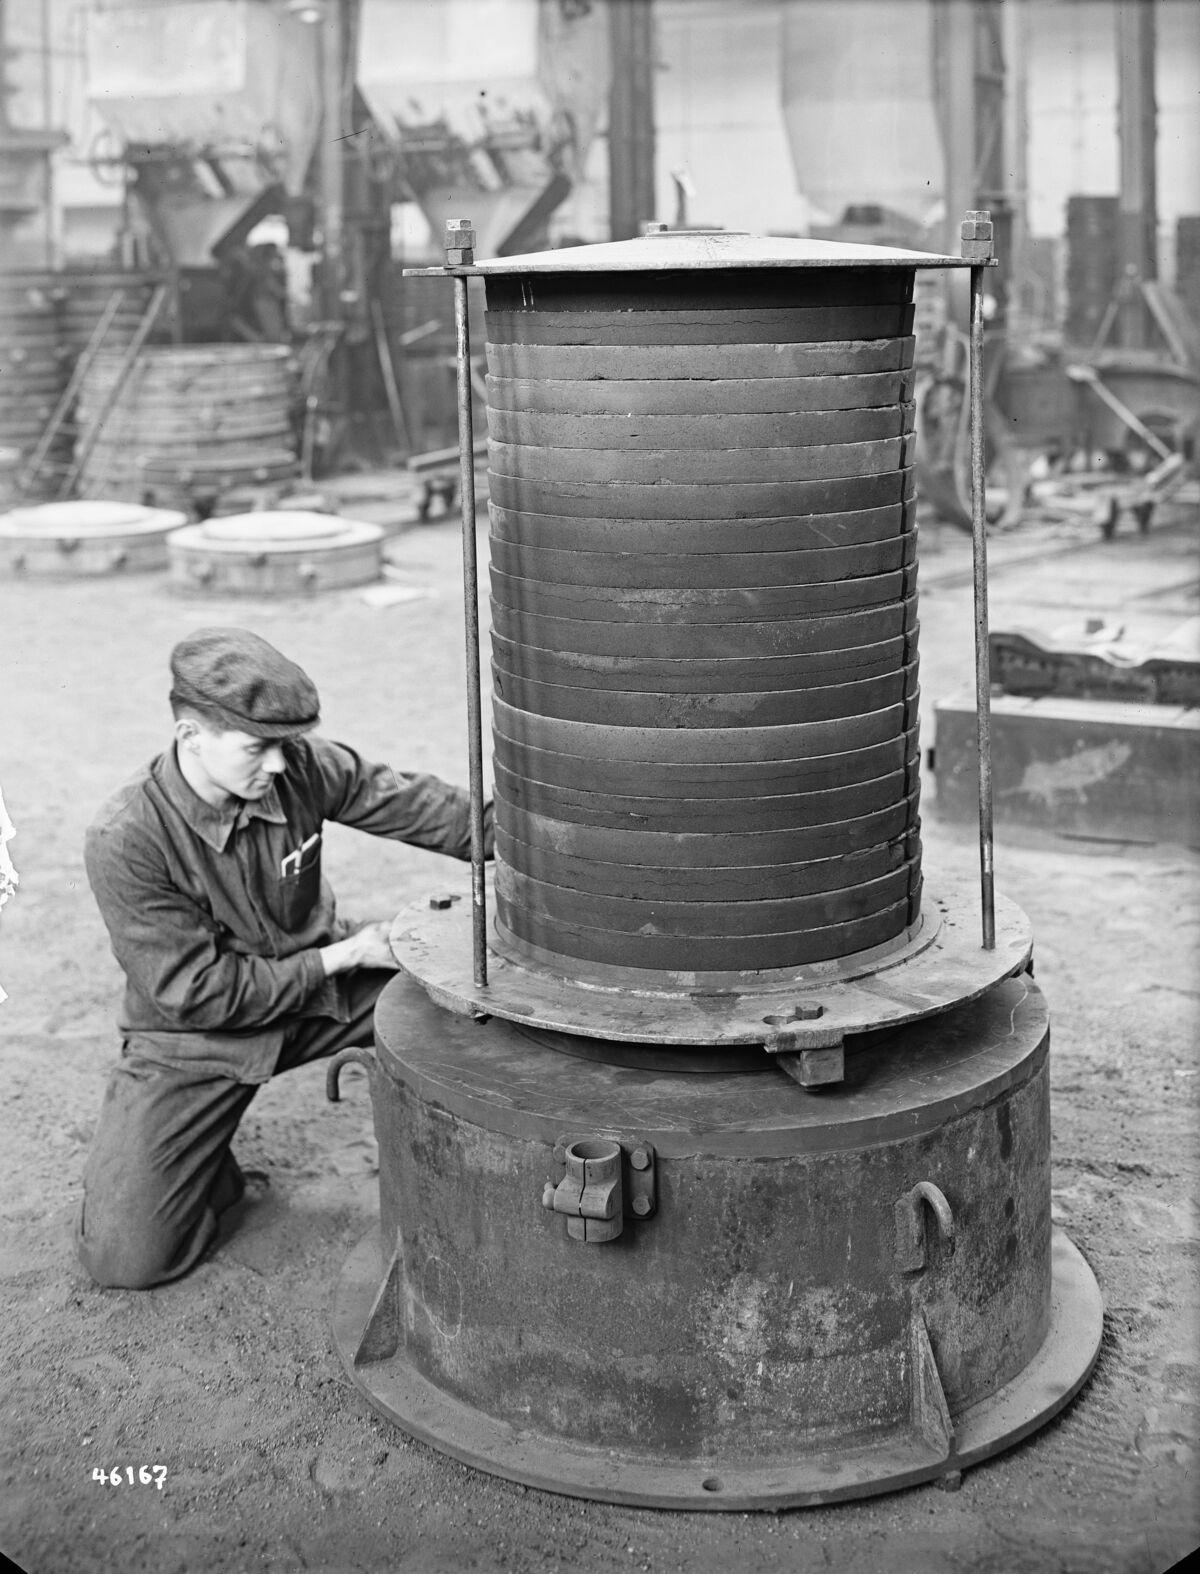 GFA 16/46167: Clamp rings for turbine BBC